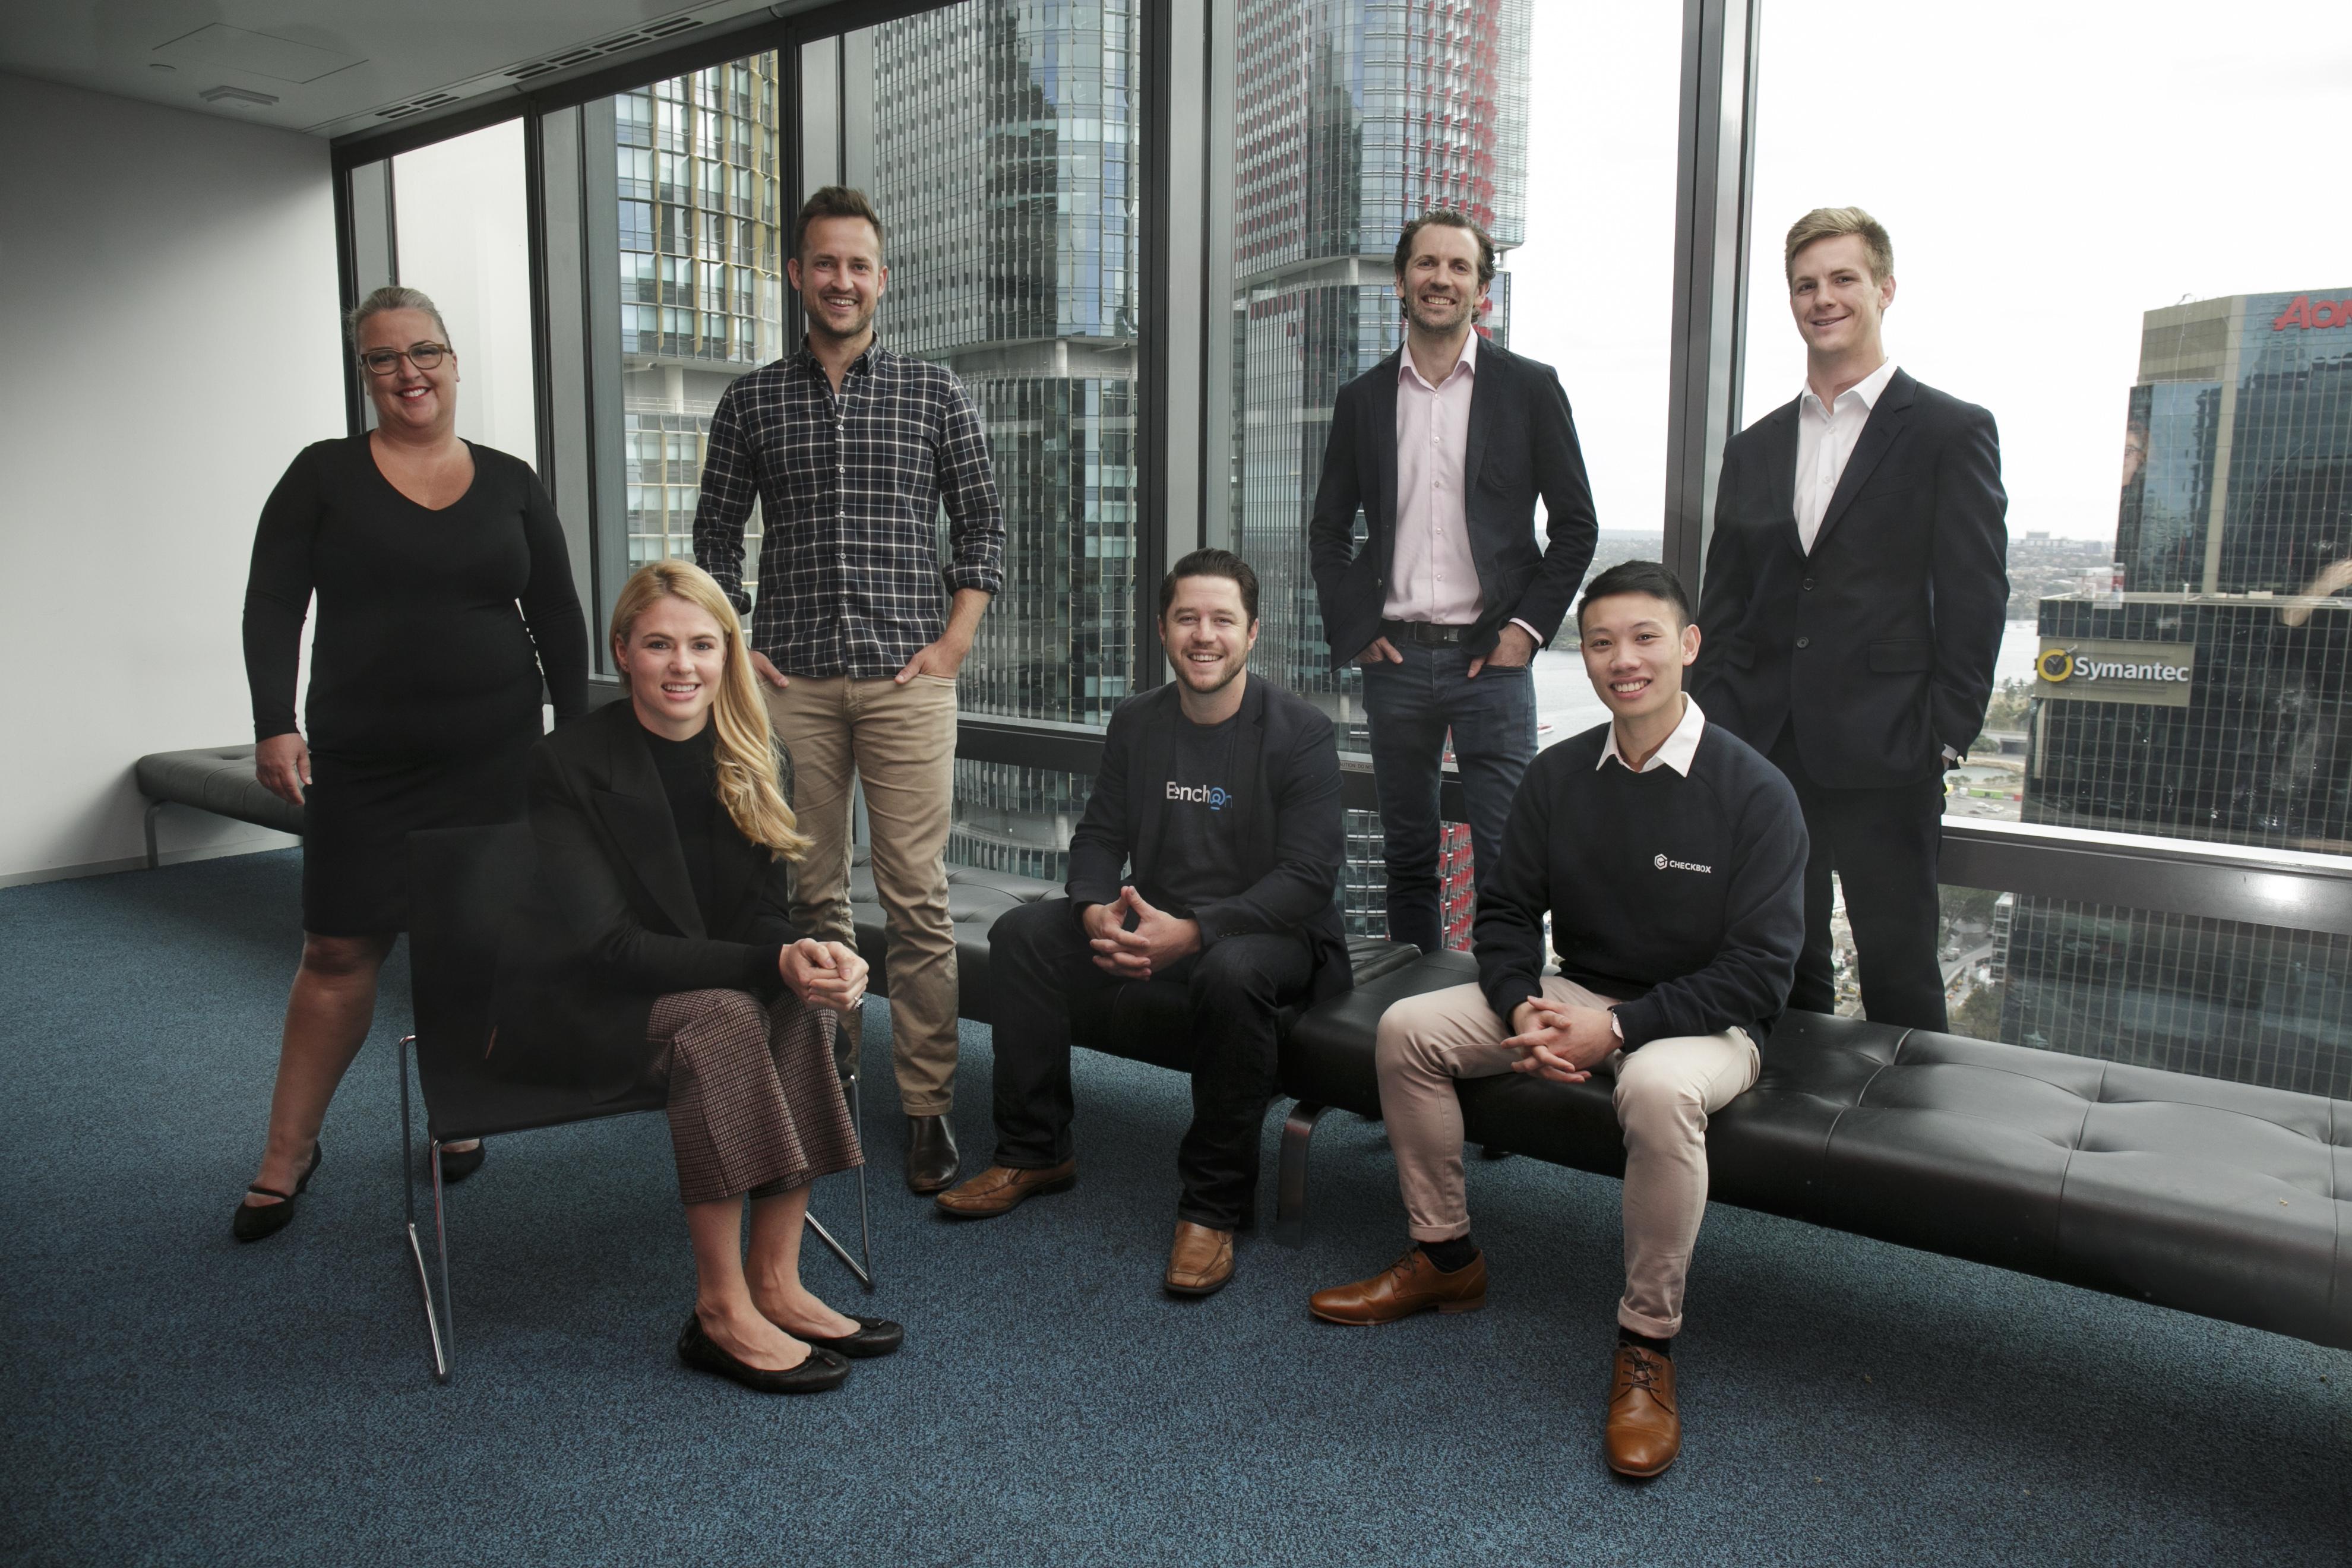 Kate Cooper (Westpac), Samantha Sidwell (Trust Investment Platform), Joel Robbie (Nod) Tim Walmsley (Benchon), Christopher Dyer (Trust Investment Platform), Evan Wong (Checkbox) Alastair Blenkin (Blenktech)